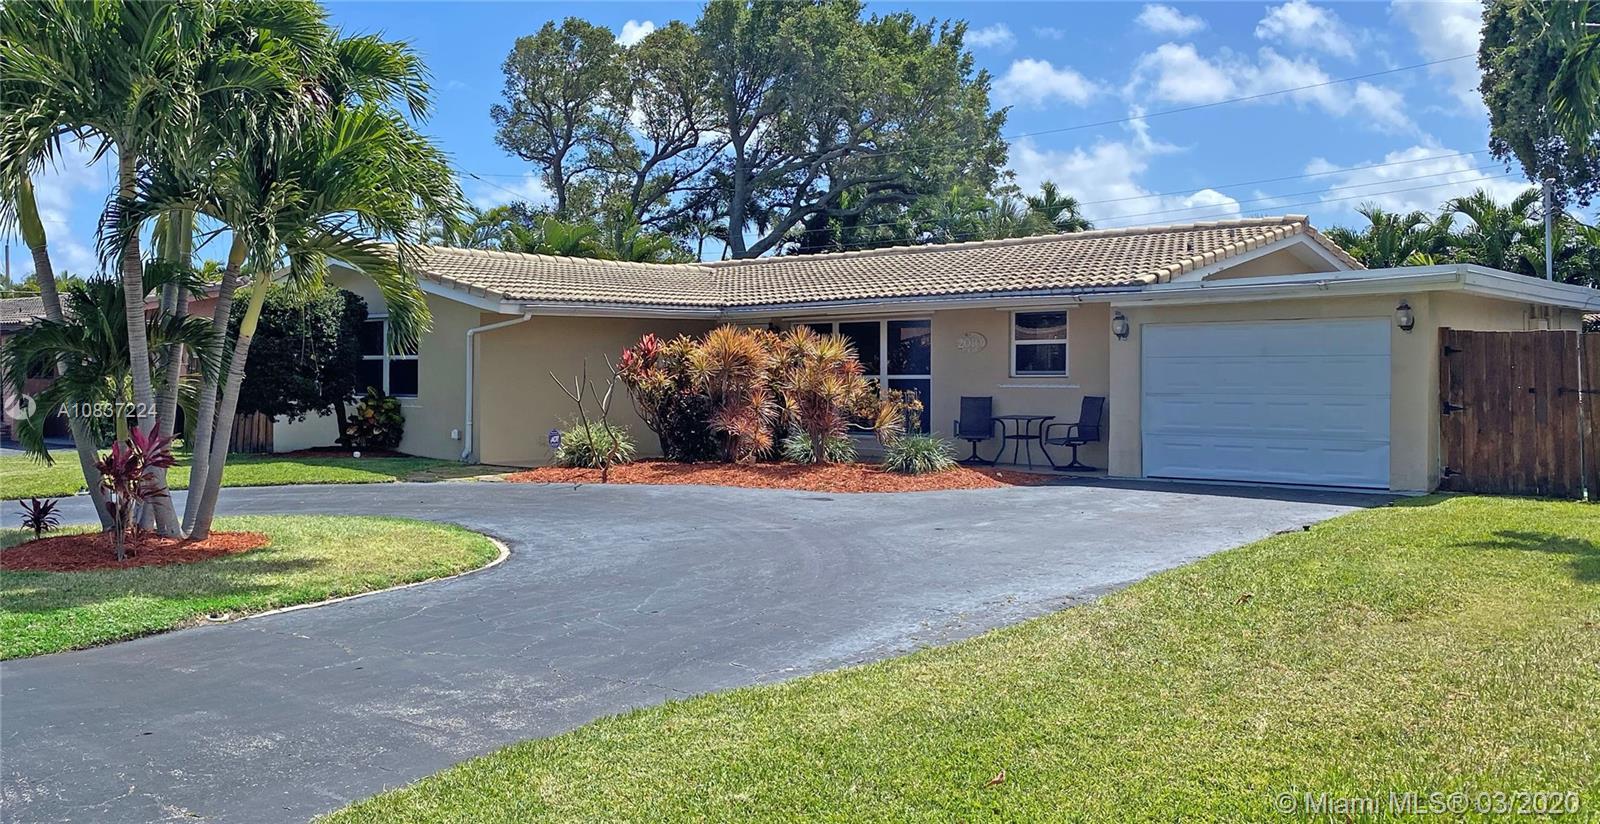 2010 NE 31st Ct, Lighthouse Point, FL 33064 - Lighthouse Point, FL real estate listing